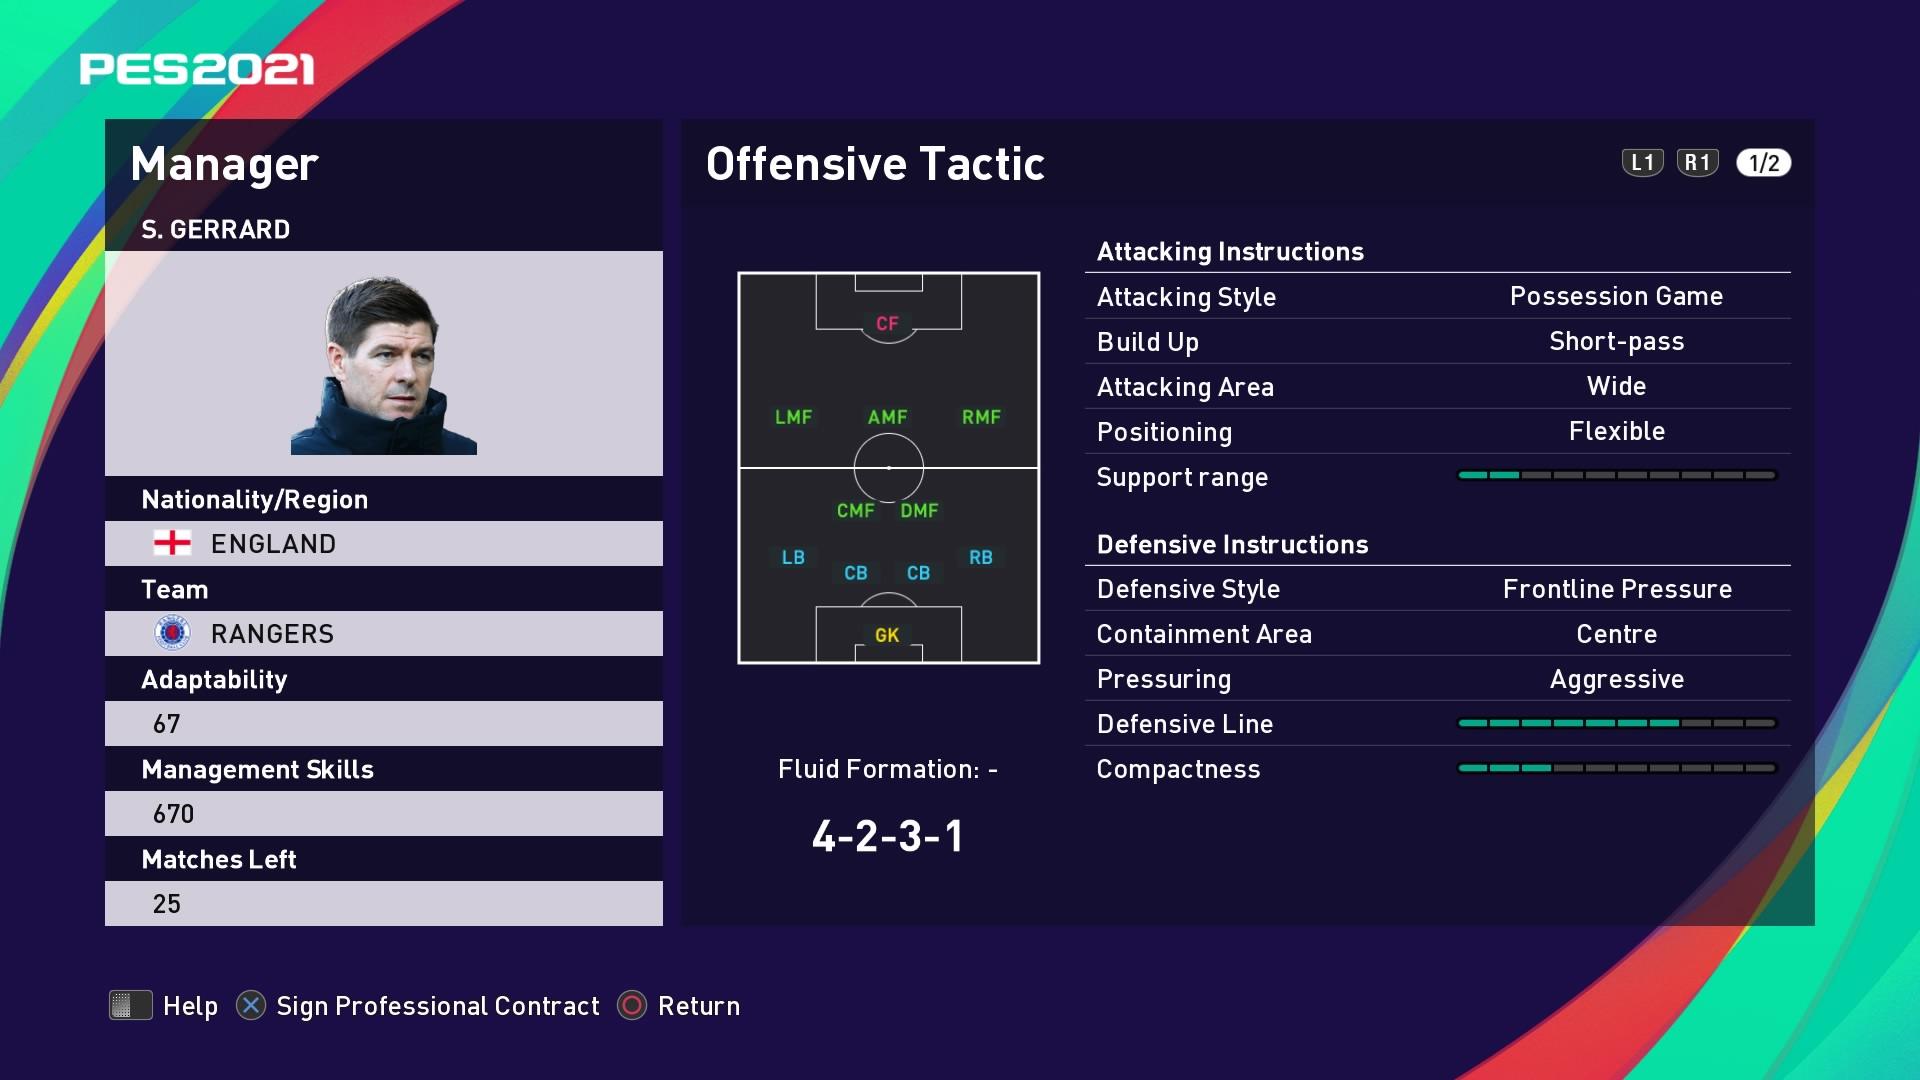 S. Gerrard (Steven Gerrard) Offensive Tactic in PES 2021 myClub